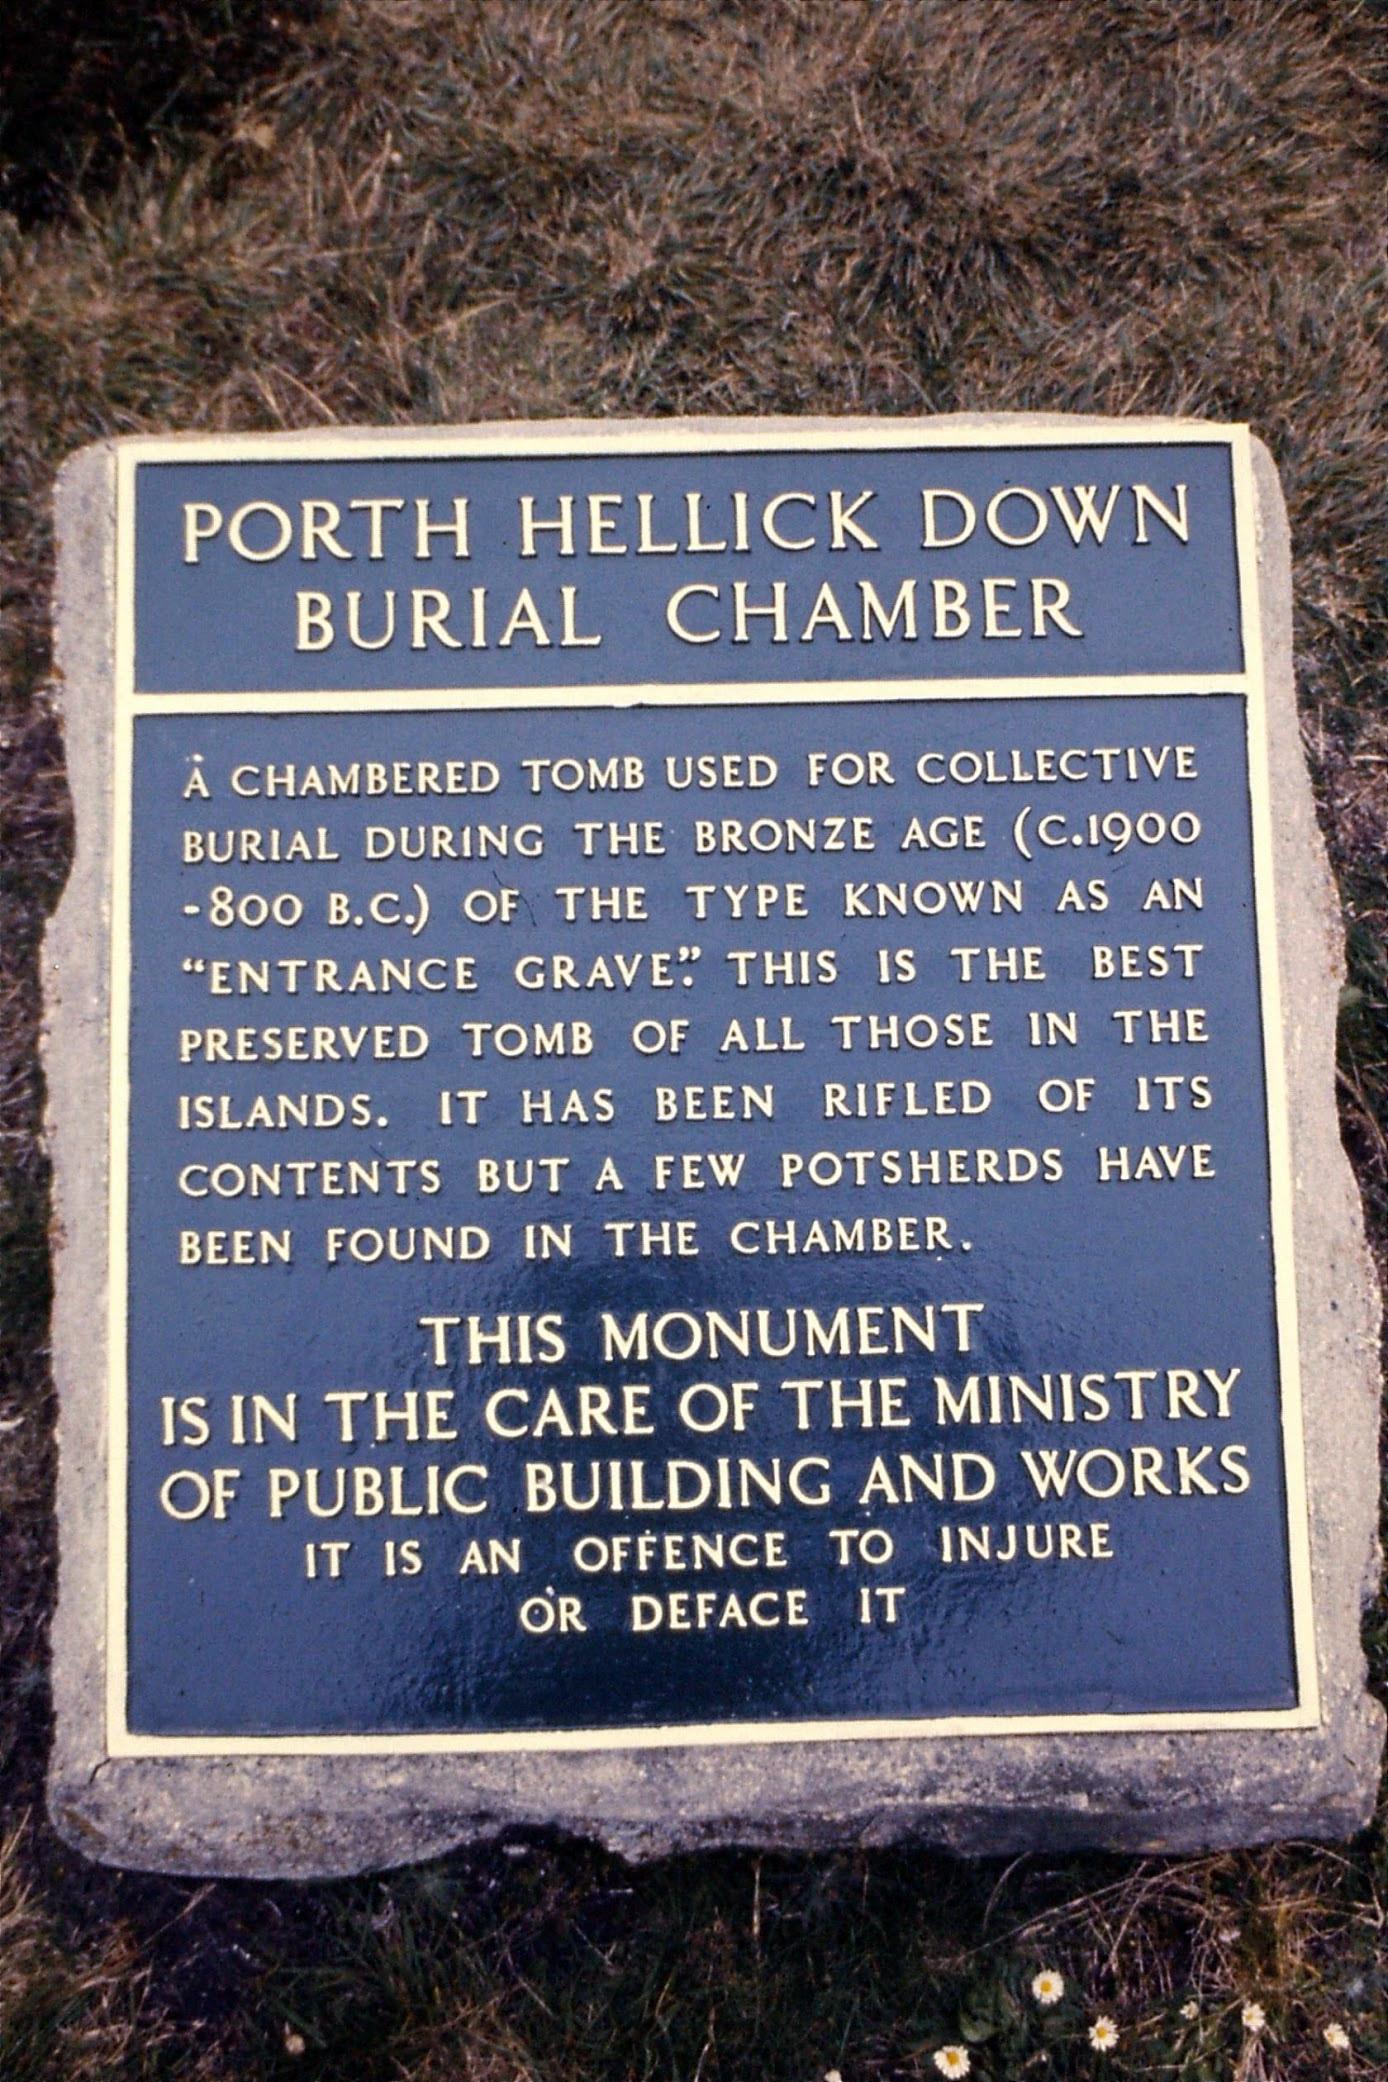 Porth_Hellick_sign